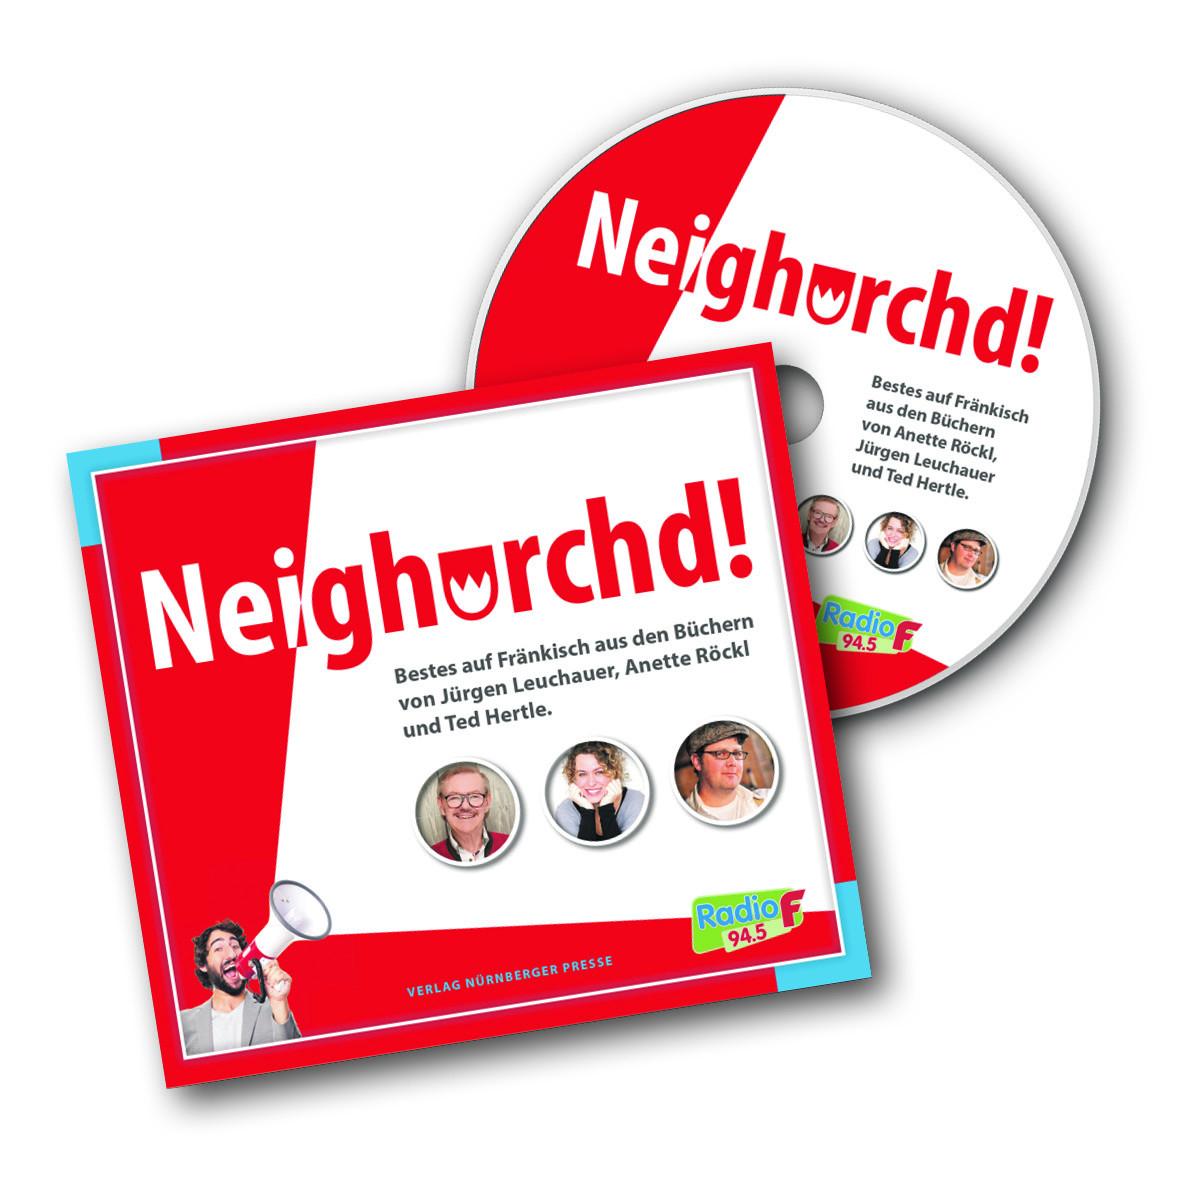 Neighorchd! - Hörbuch